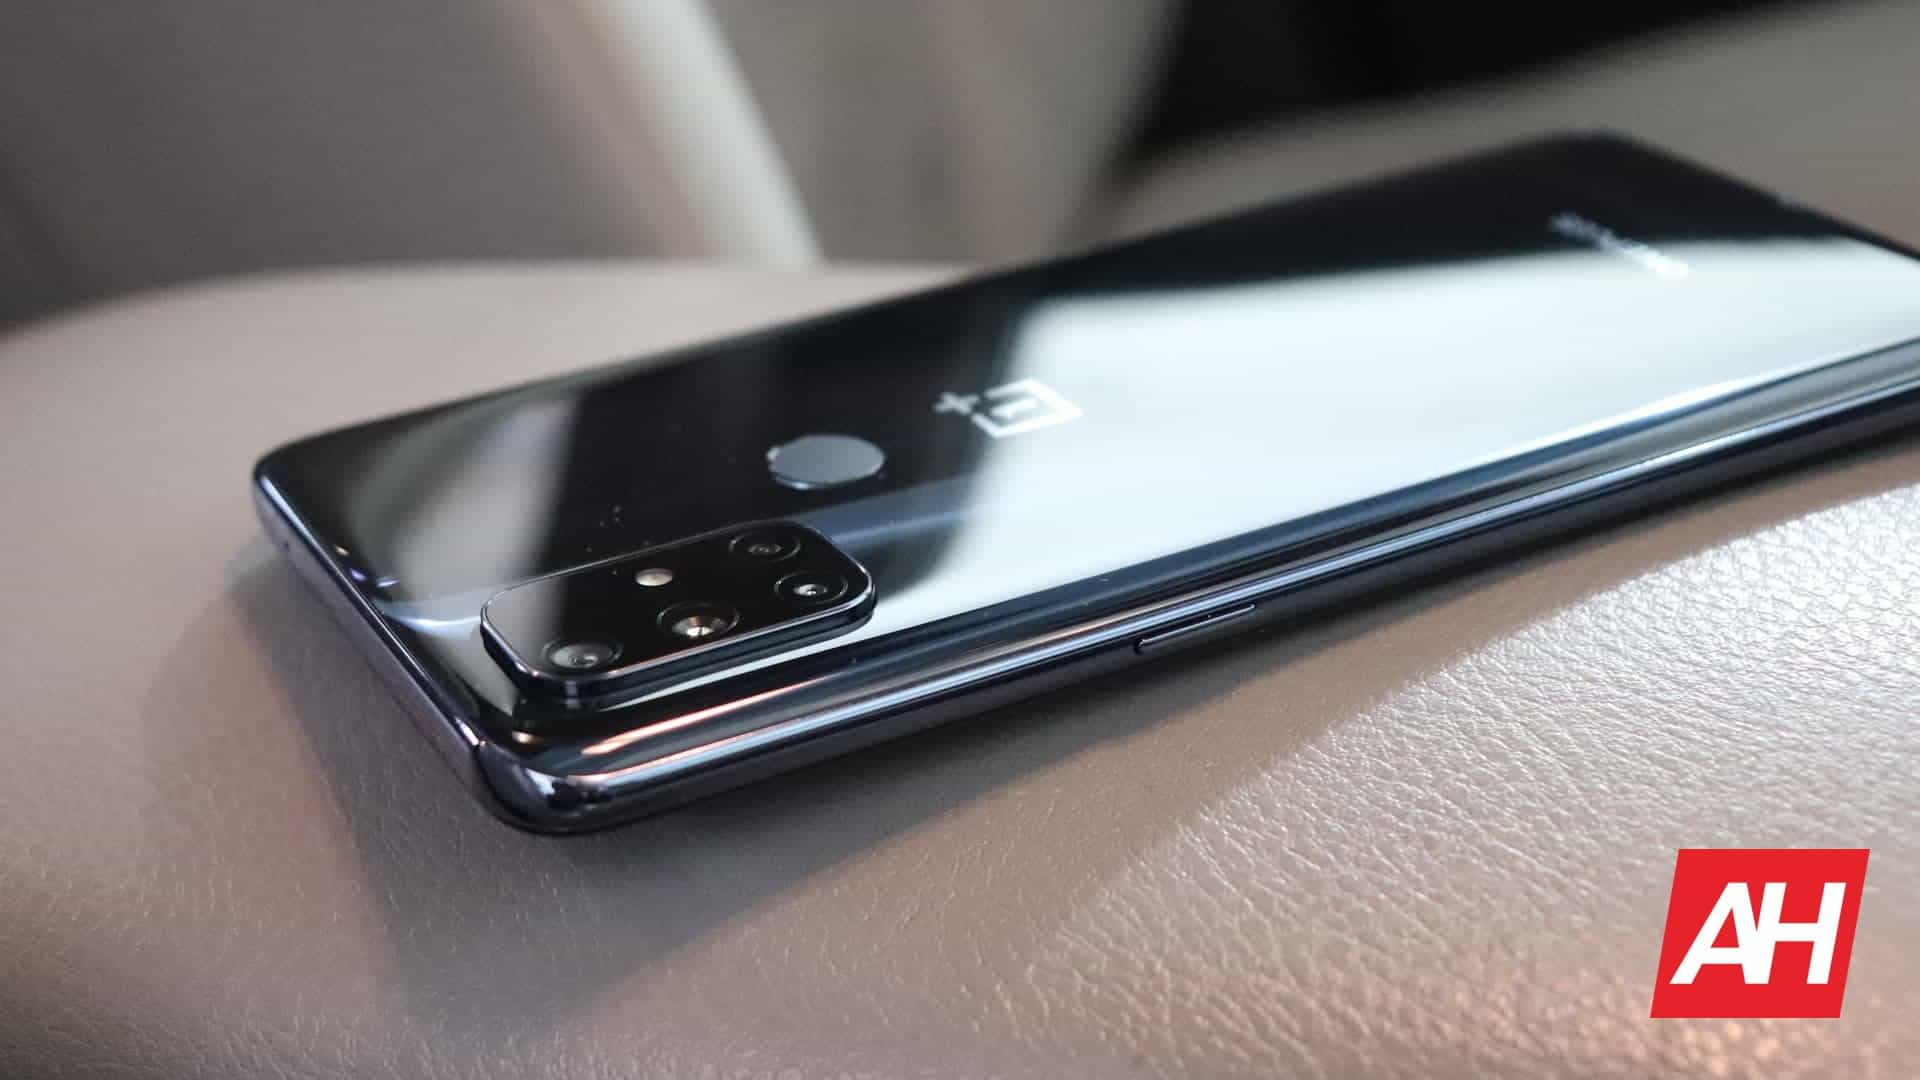 01 2 OnePlus Nord N10 5G Hardware DG AH 2020